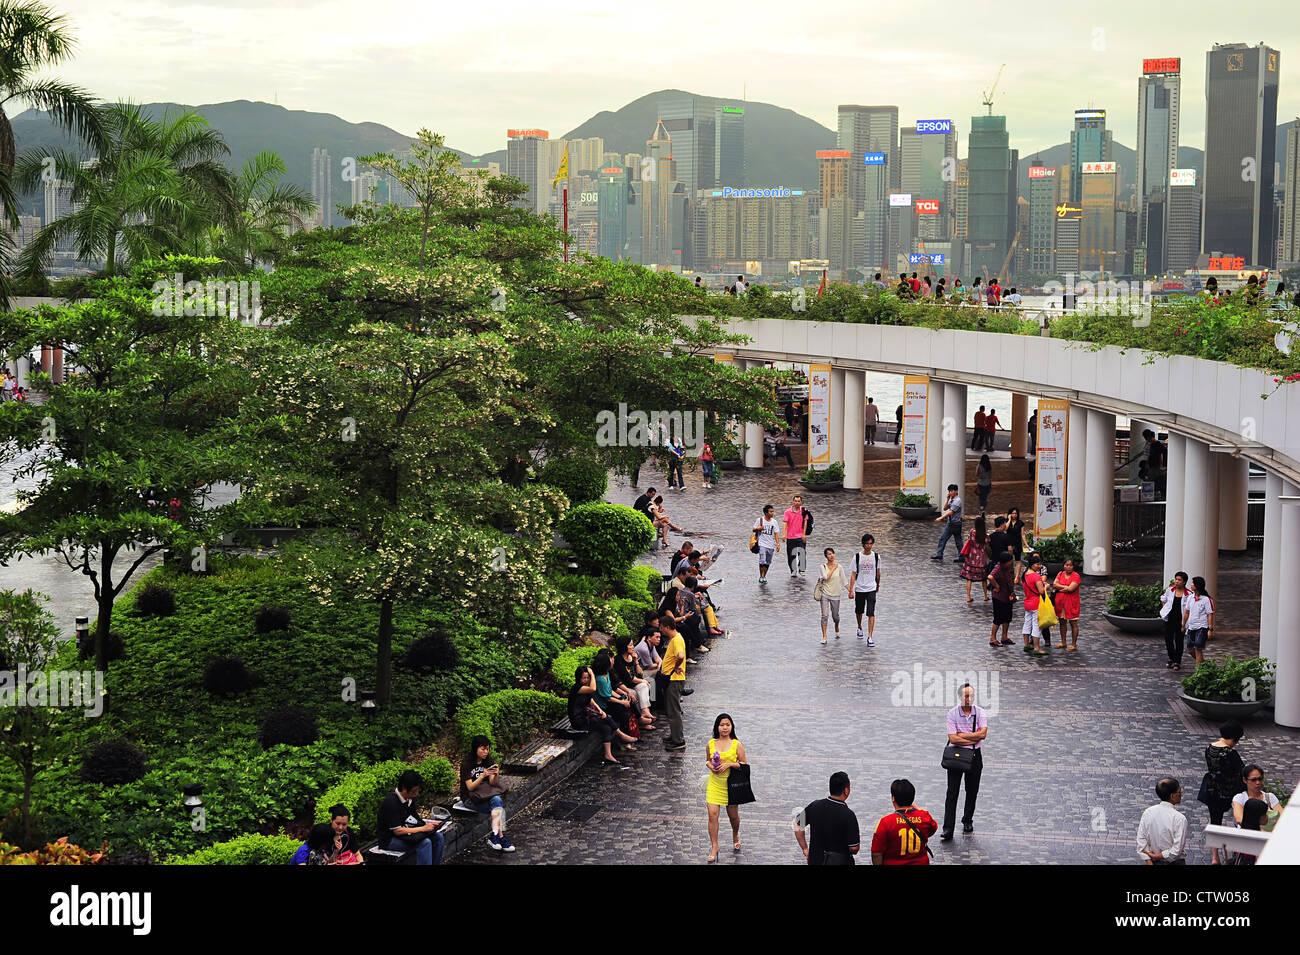 People at Tsim Sha Tsui at sunset. - Stock Image